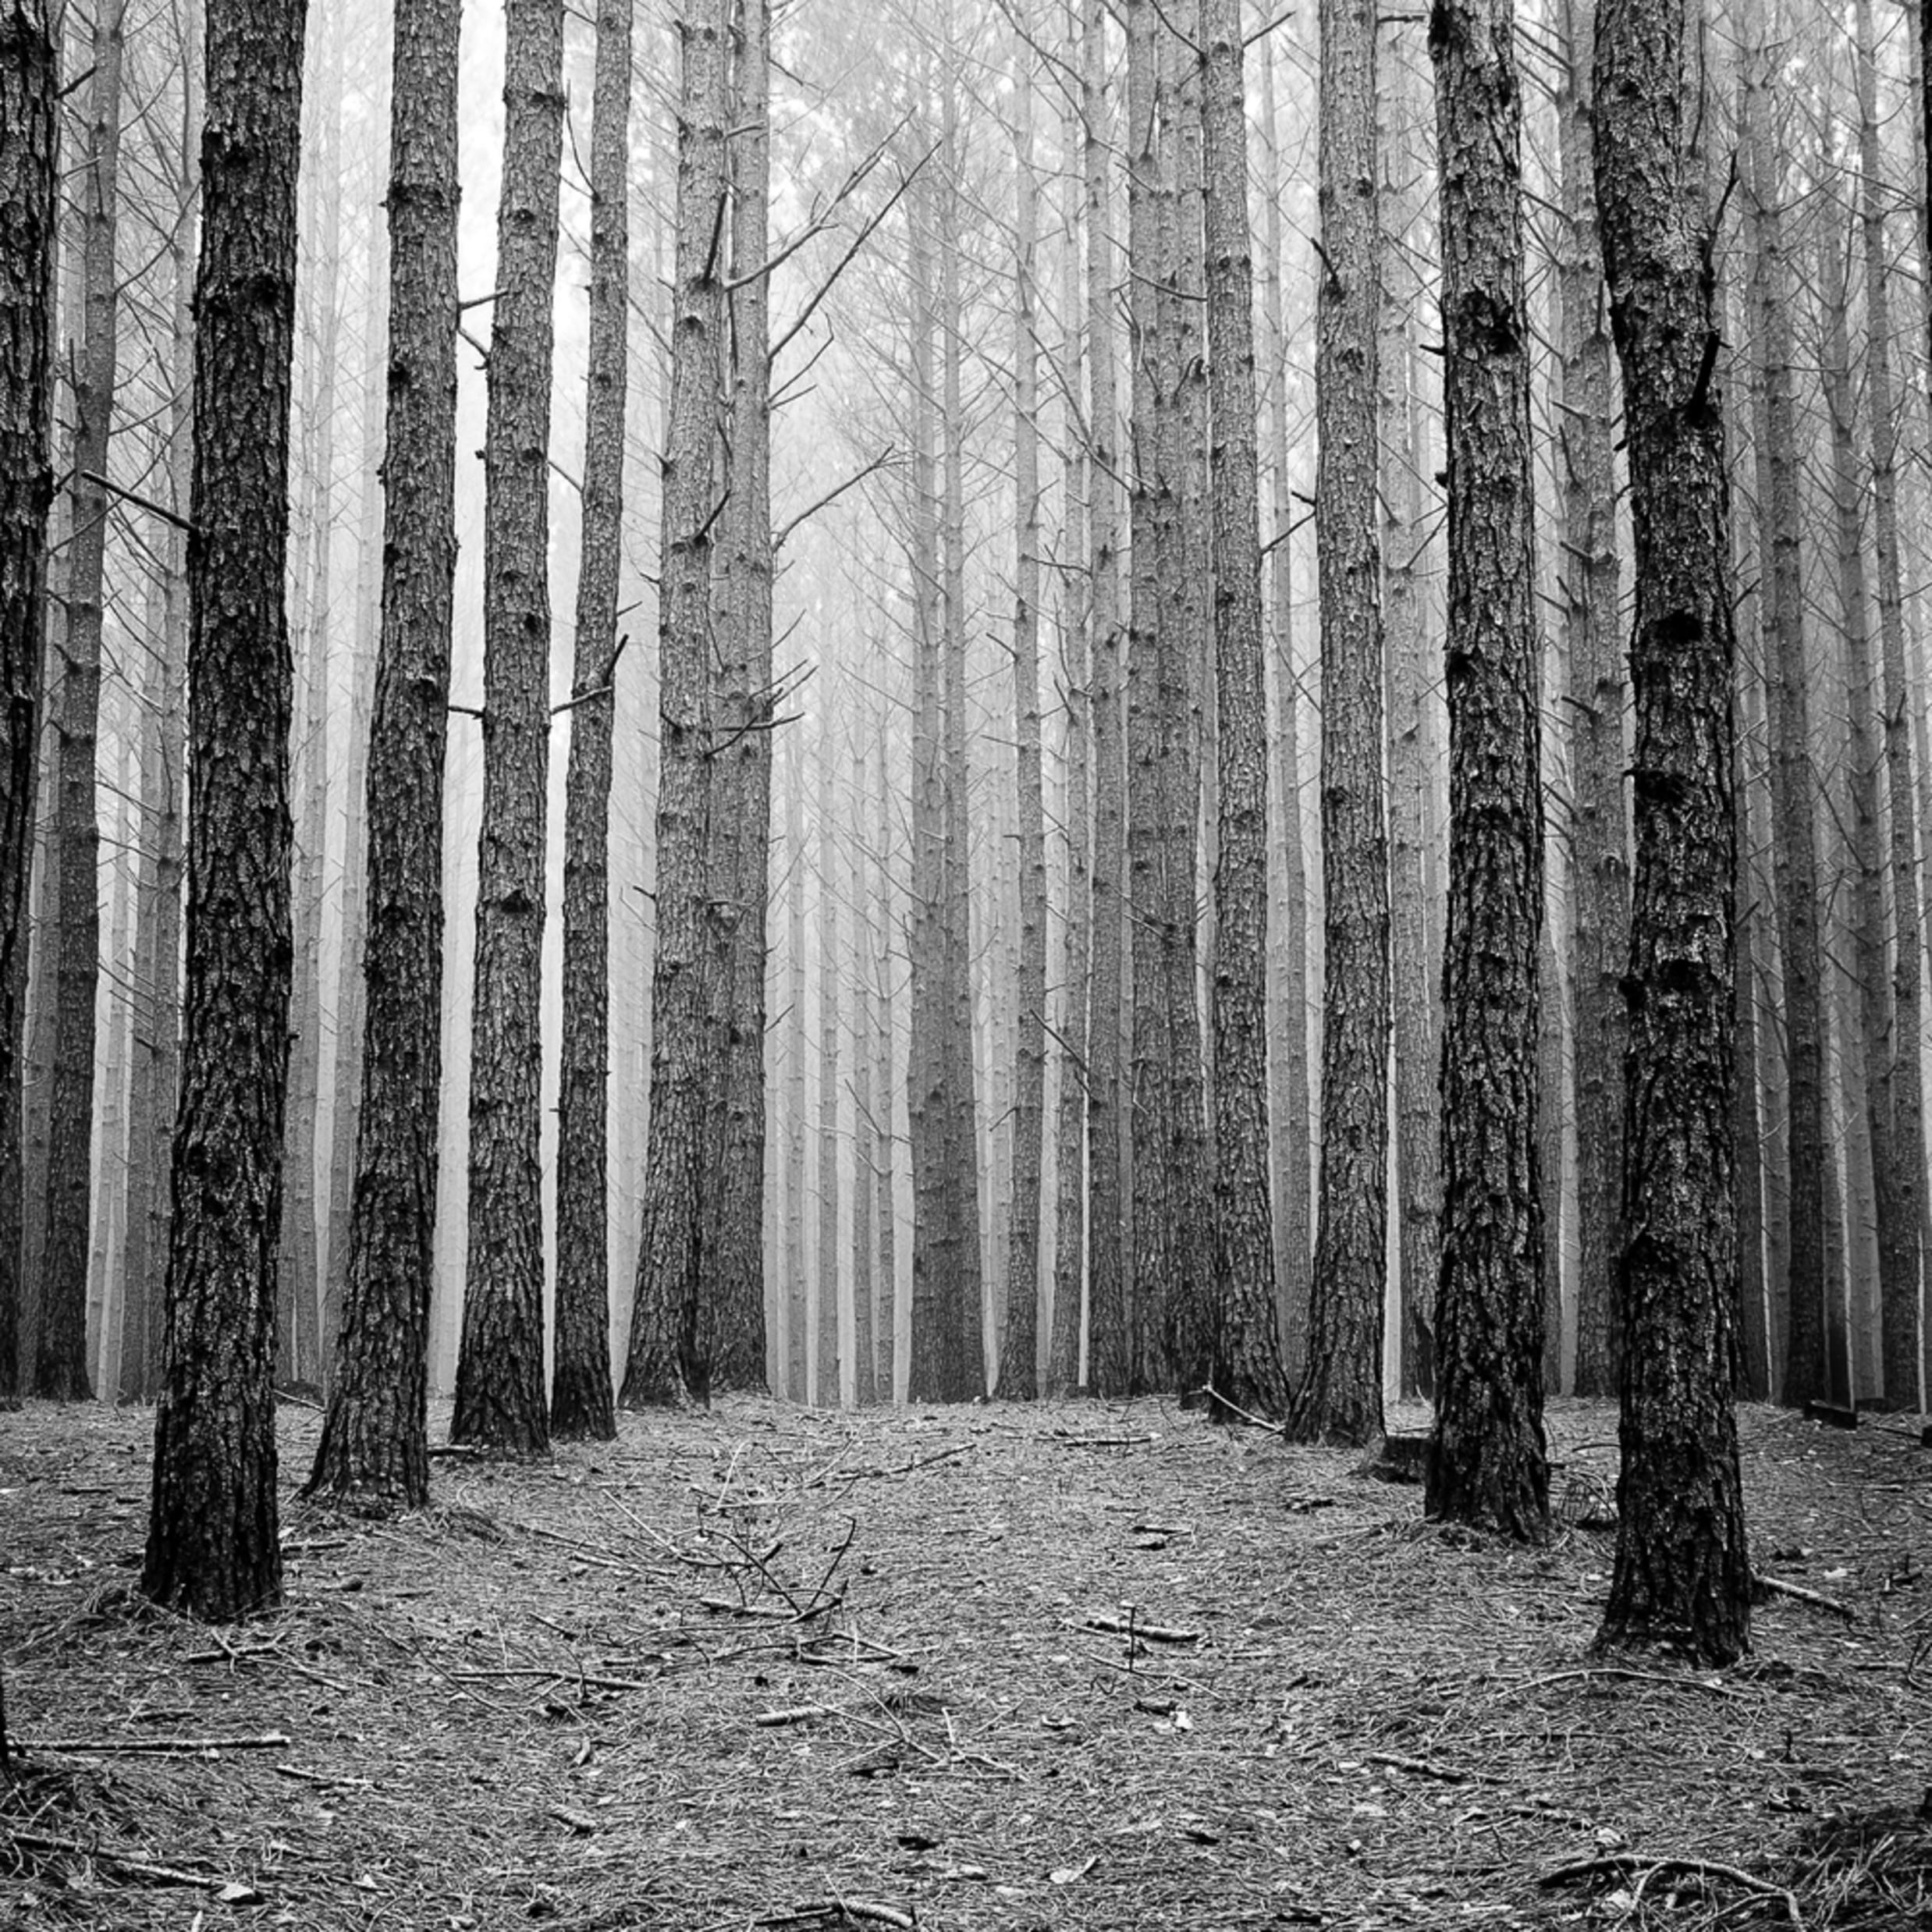 Pineforestforprinting final 4328 eiqqqm